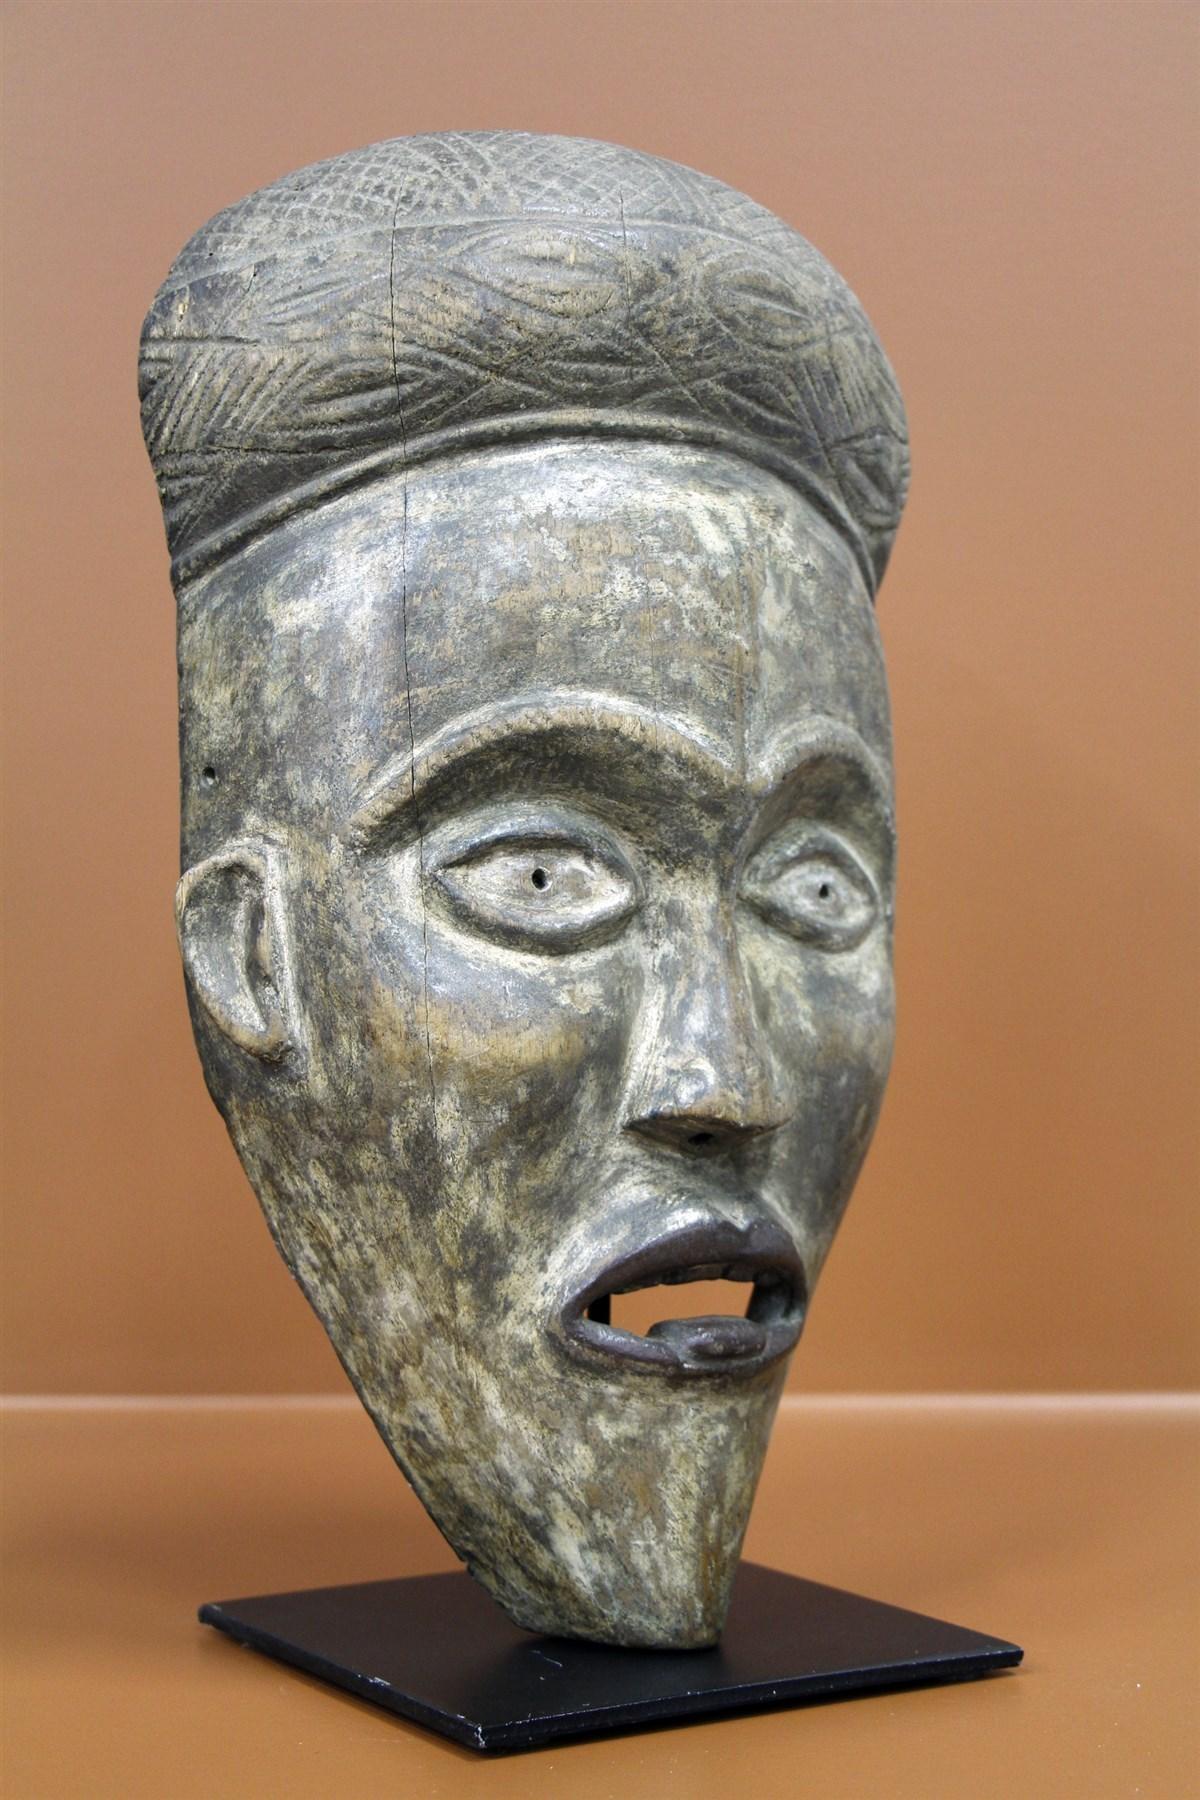 Masque Kongo Vili - Déco africaine - Art africain traditionnel